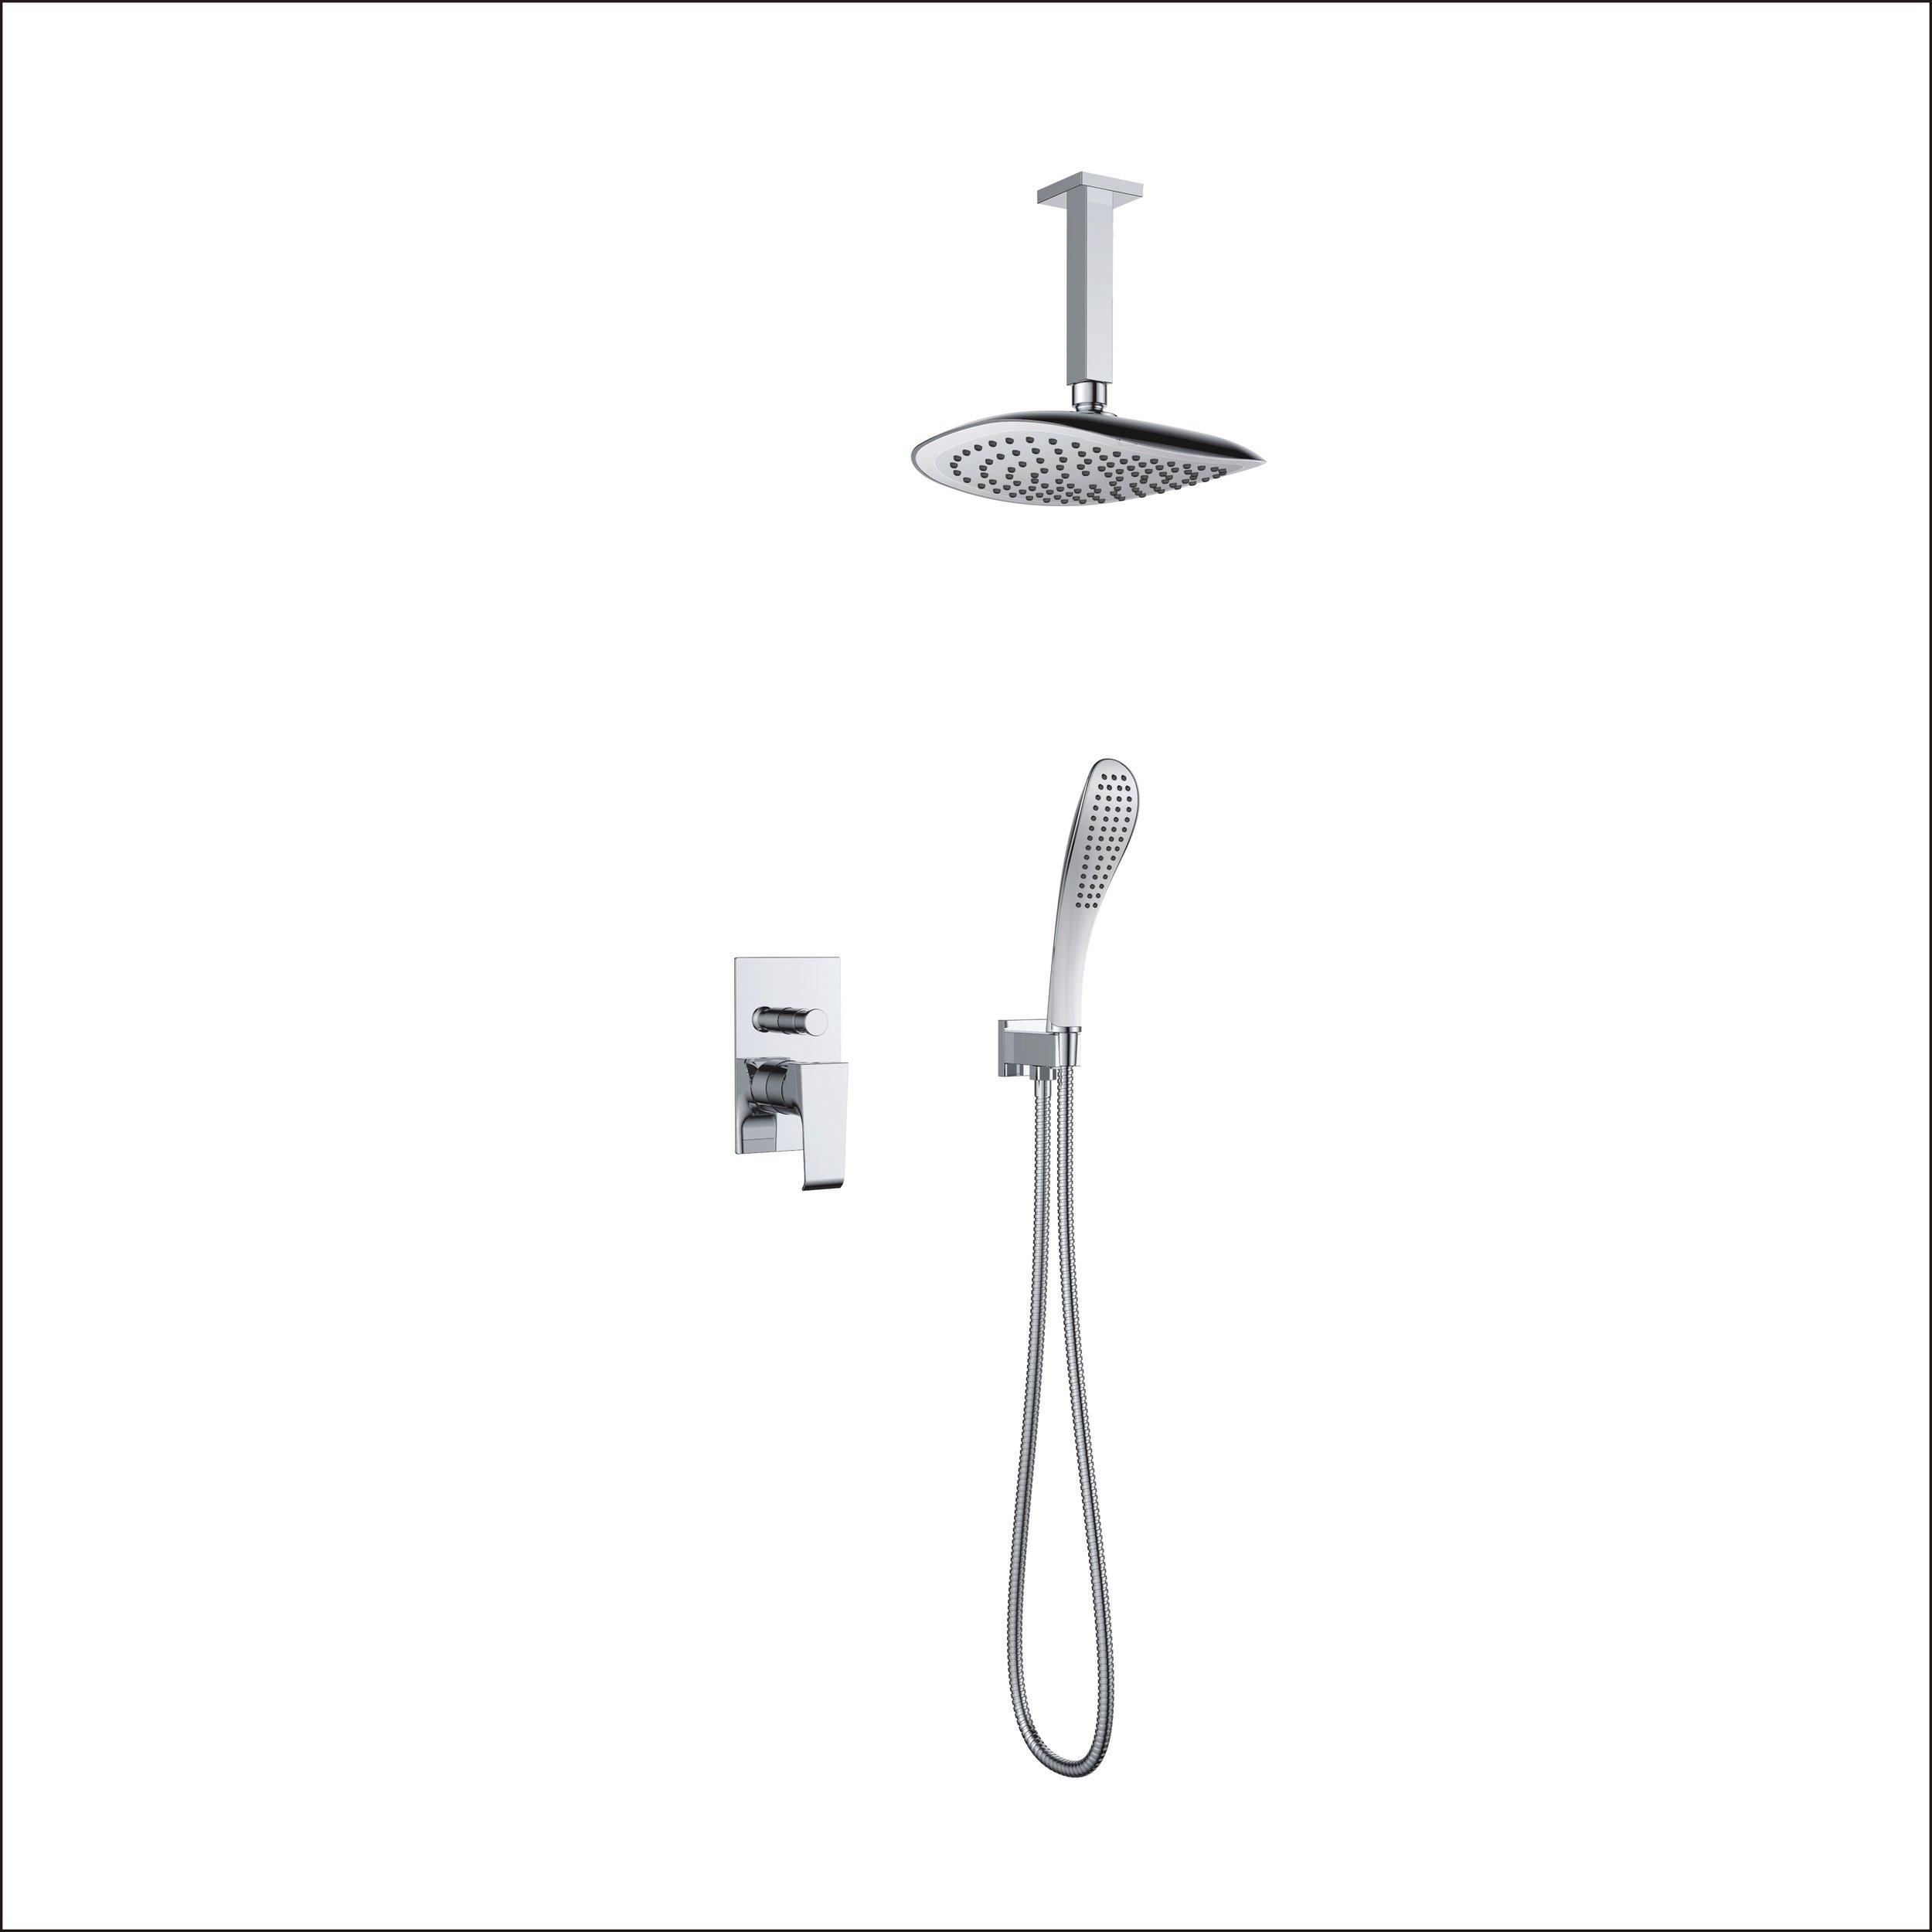 7167-106:Concealed shower valve with shower set and head shower